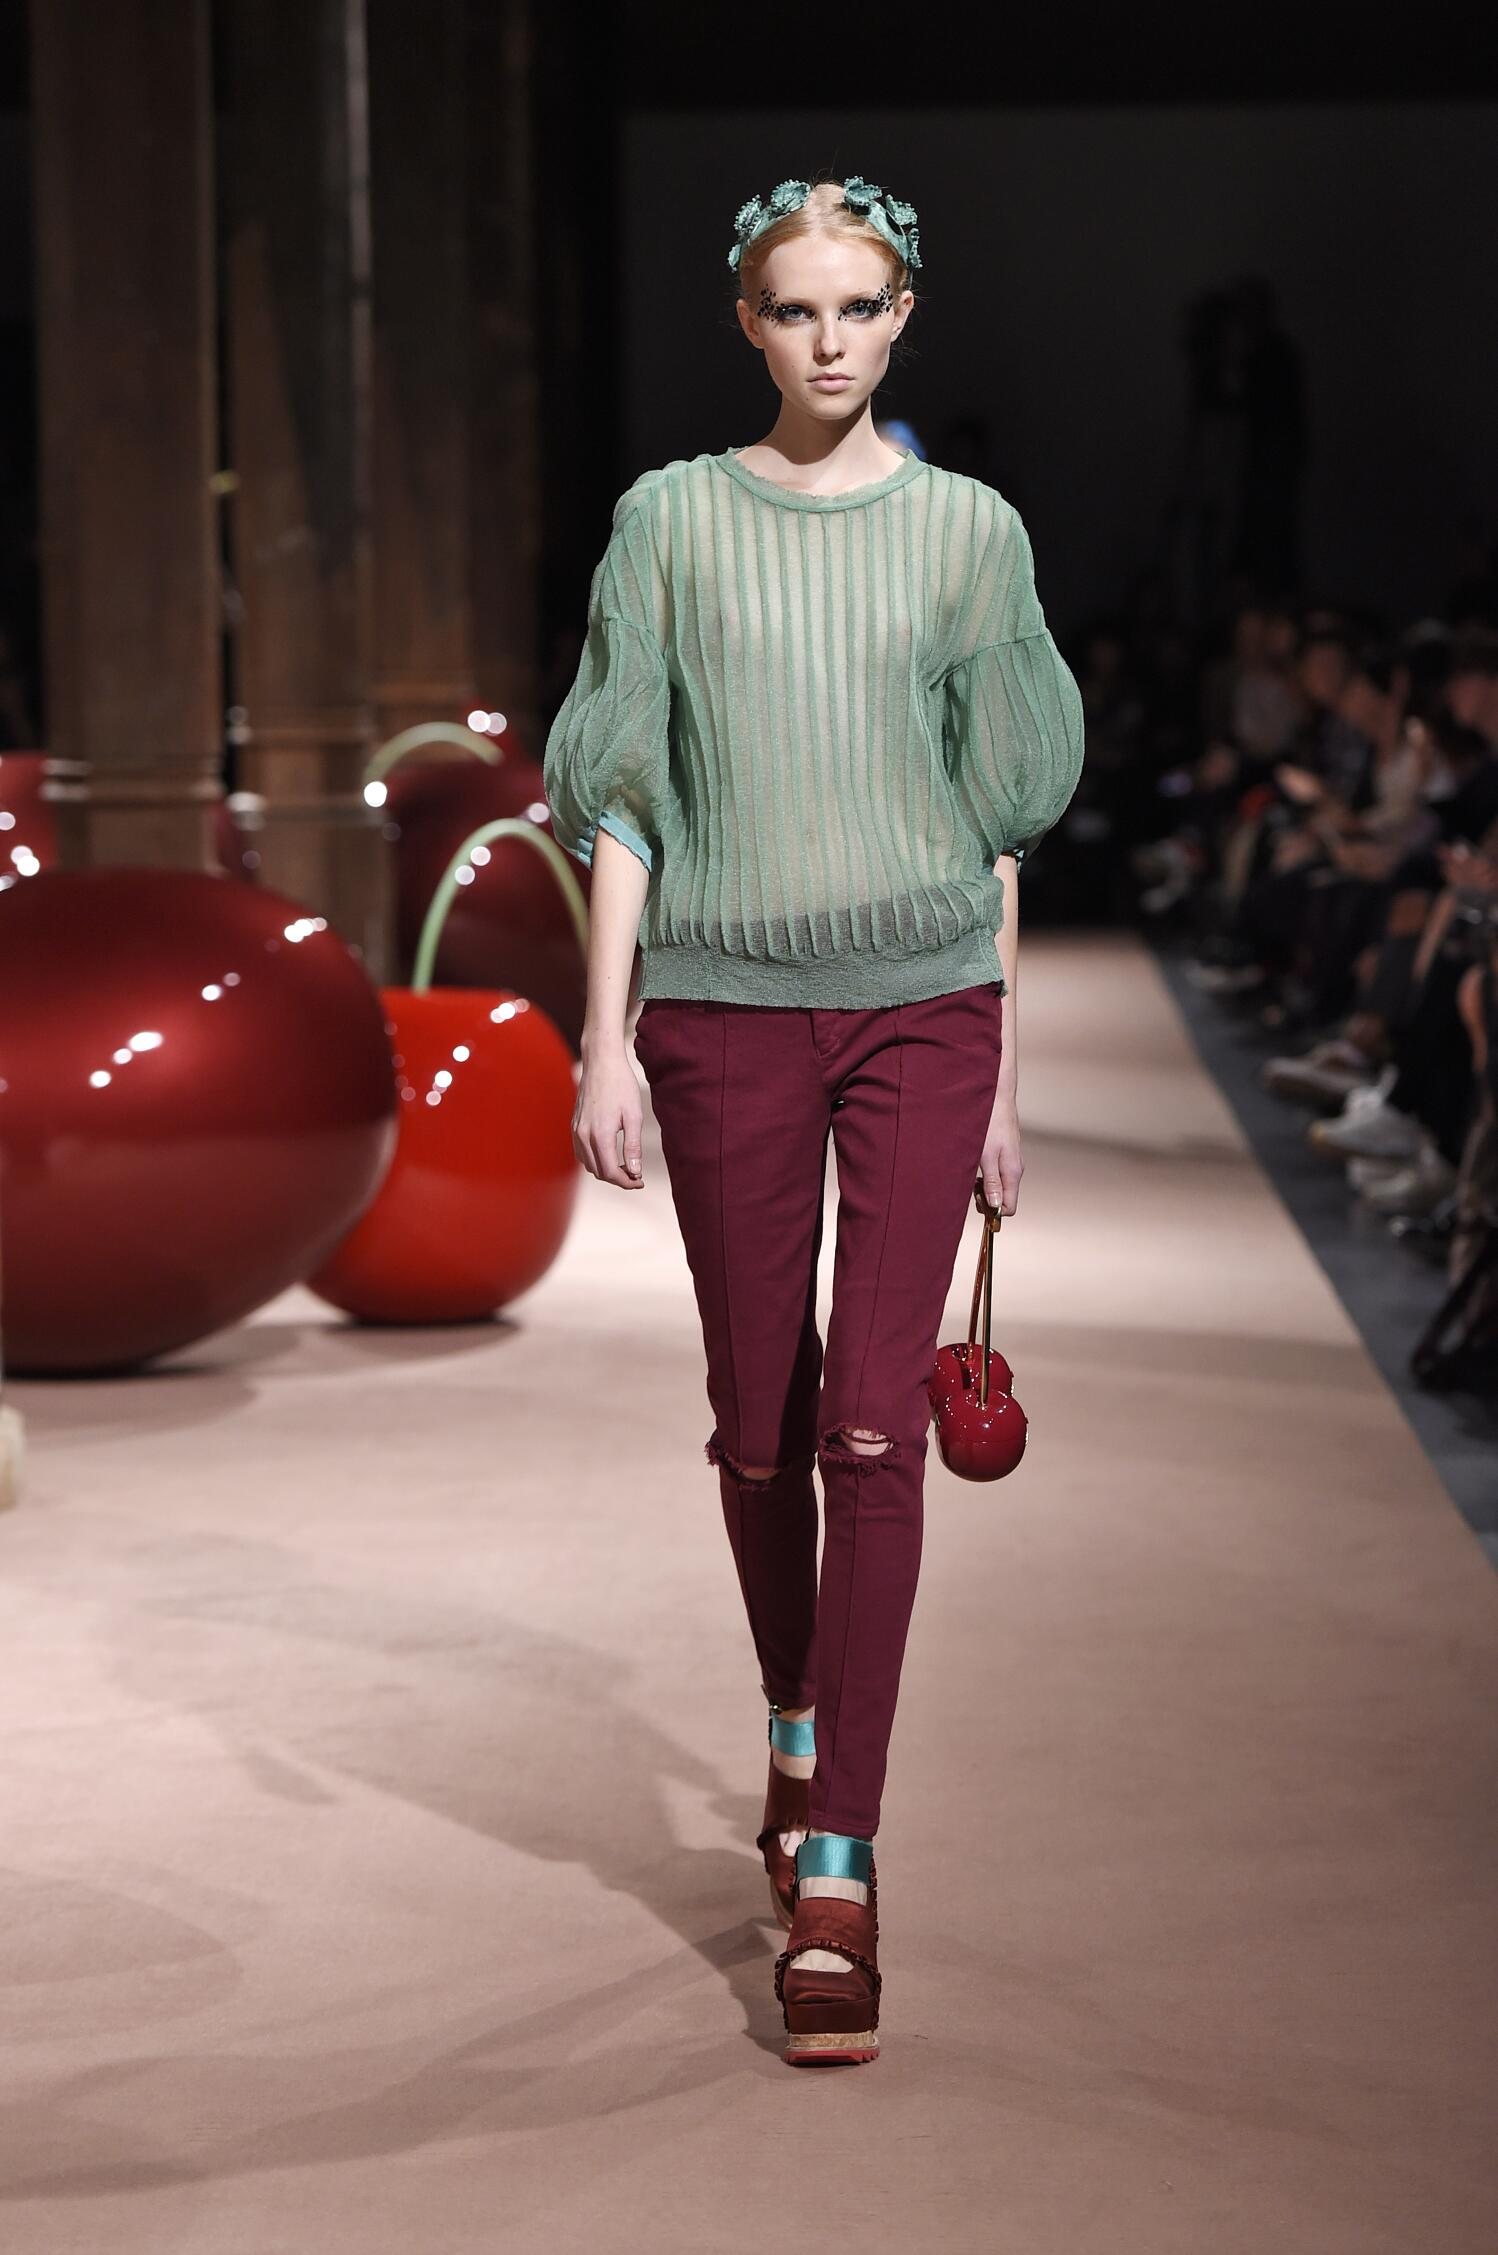 Fashion Model Undercover Catwalk